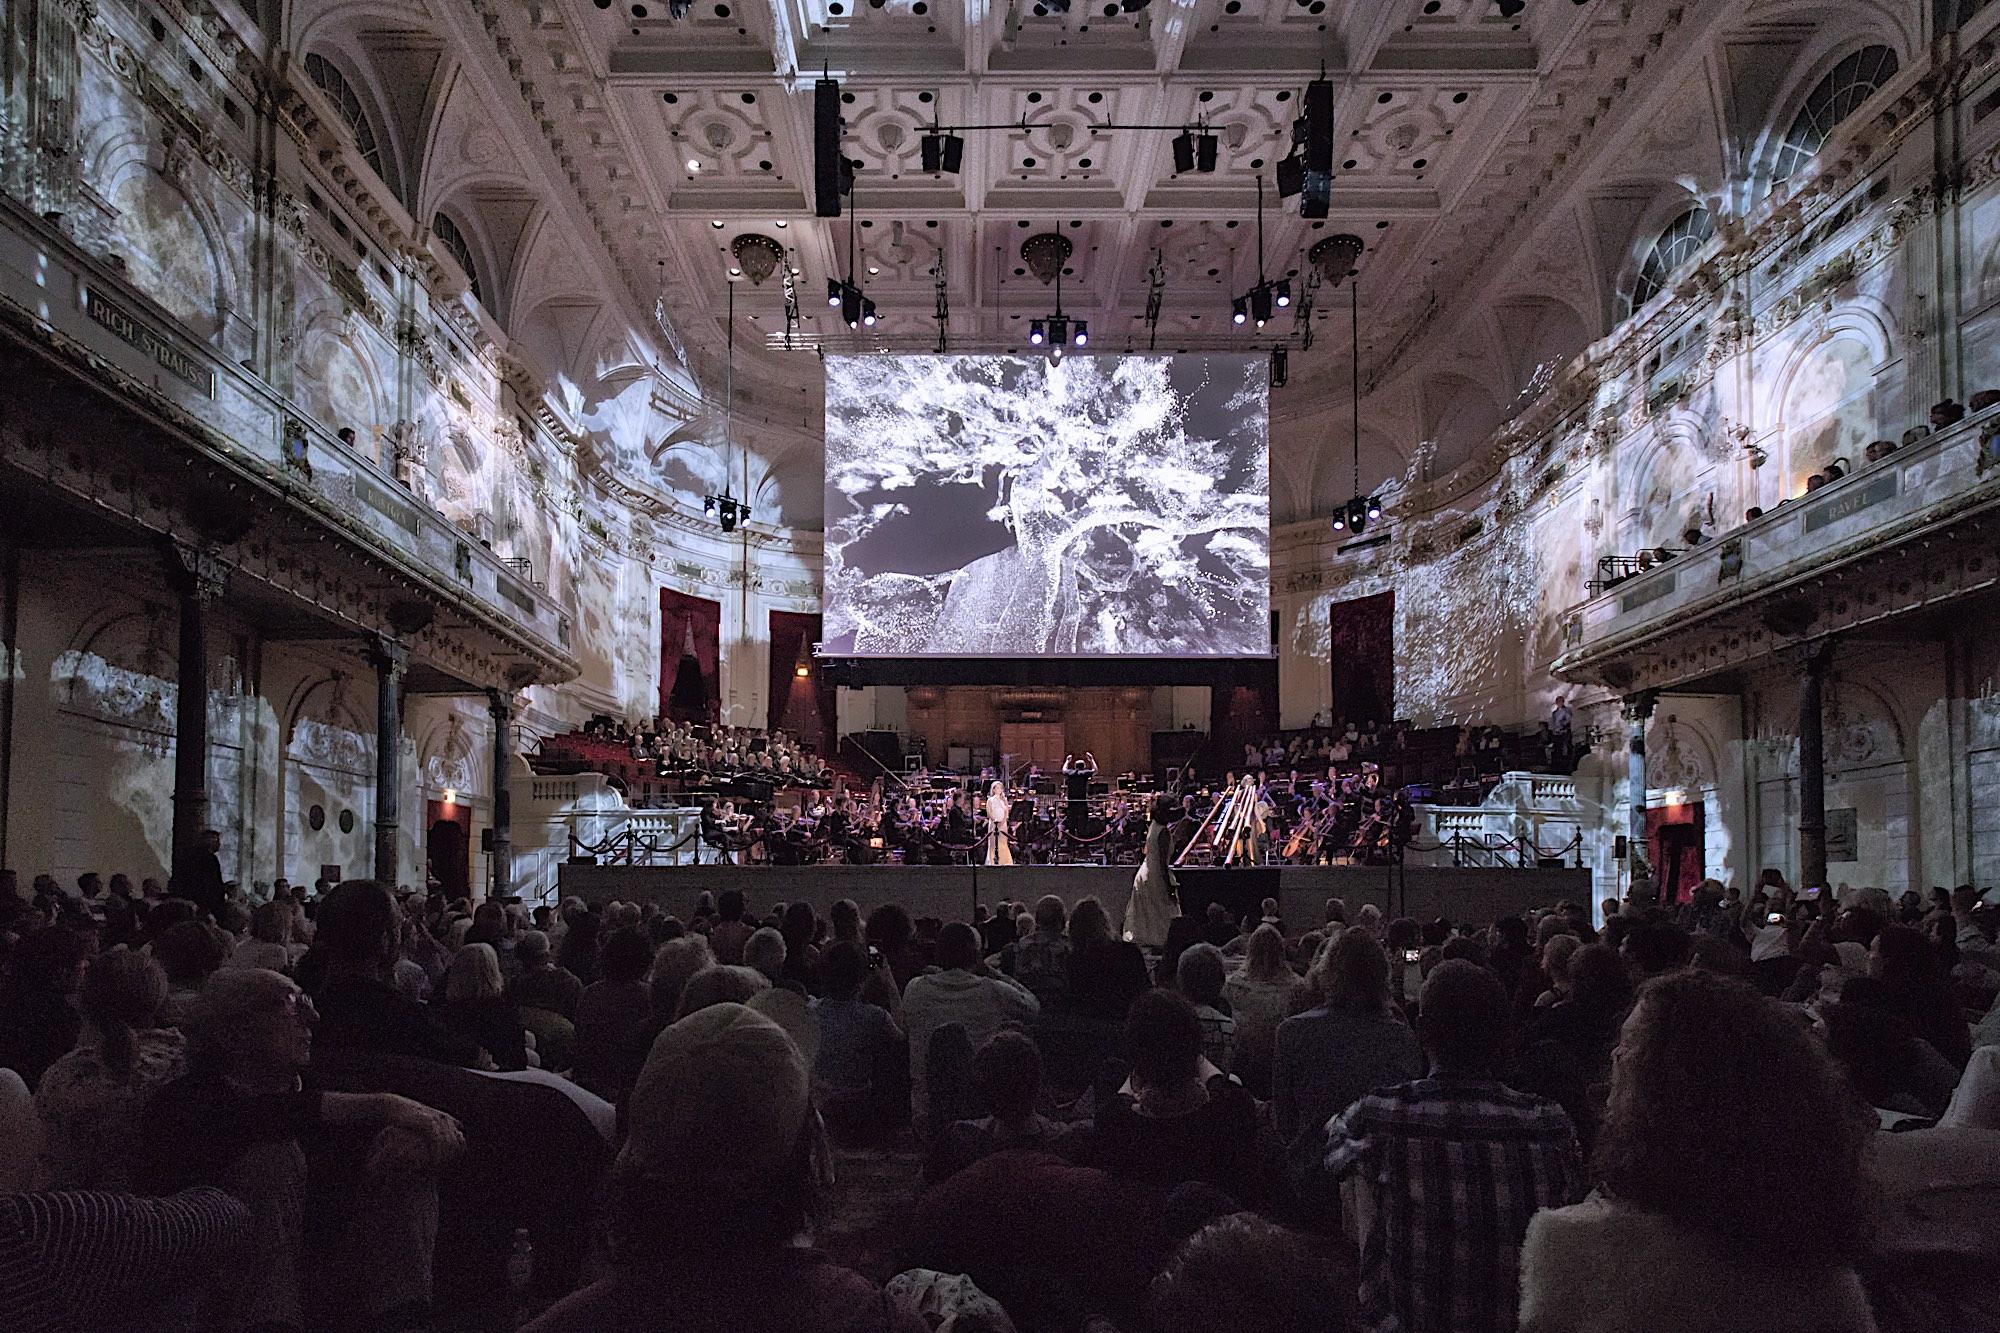 Premiering at the Concertgebouw Amsterdam, Holland Festival Proms 2017